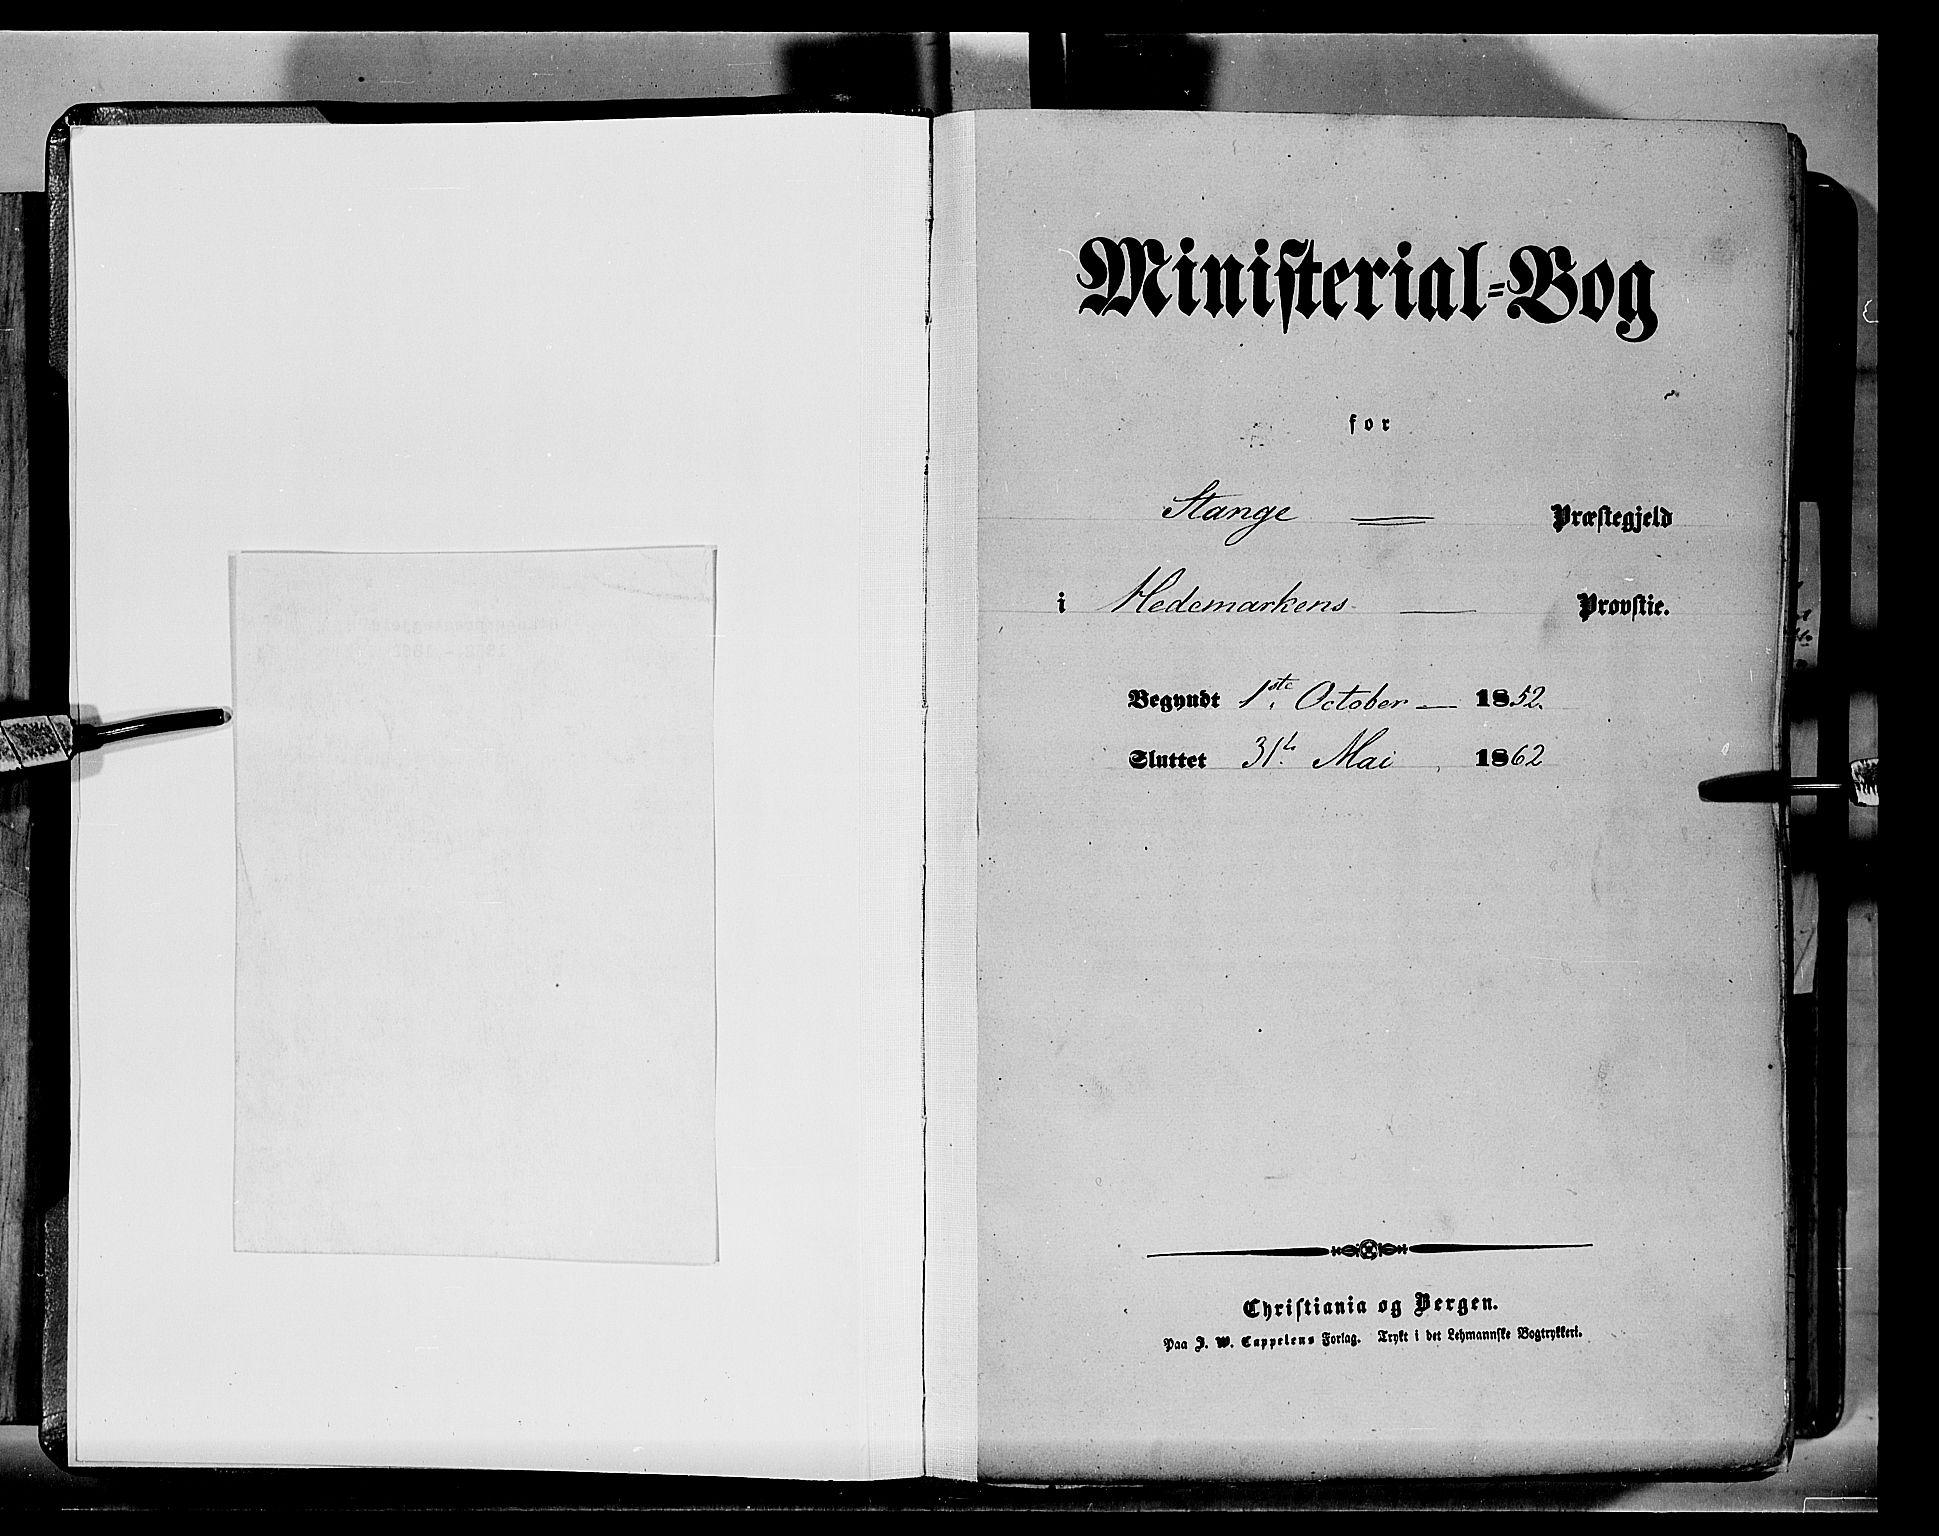 SAH, Stange prestekontor, K/L0012: Ministerialbok nr. 12, 1852-1862